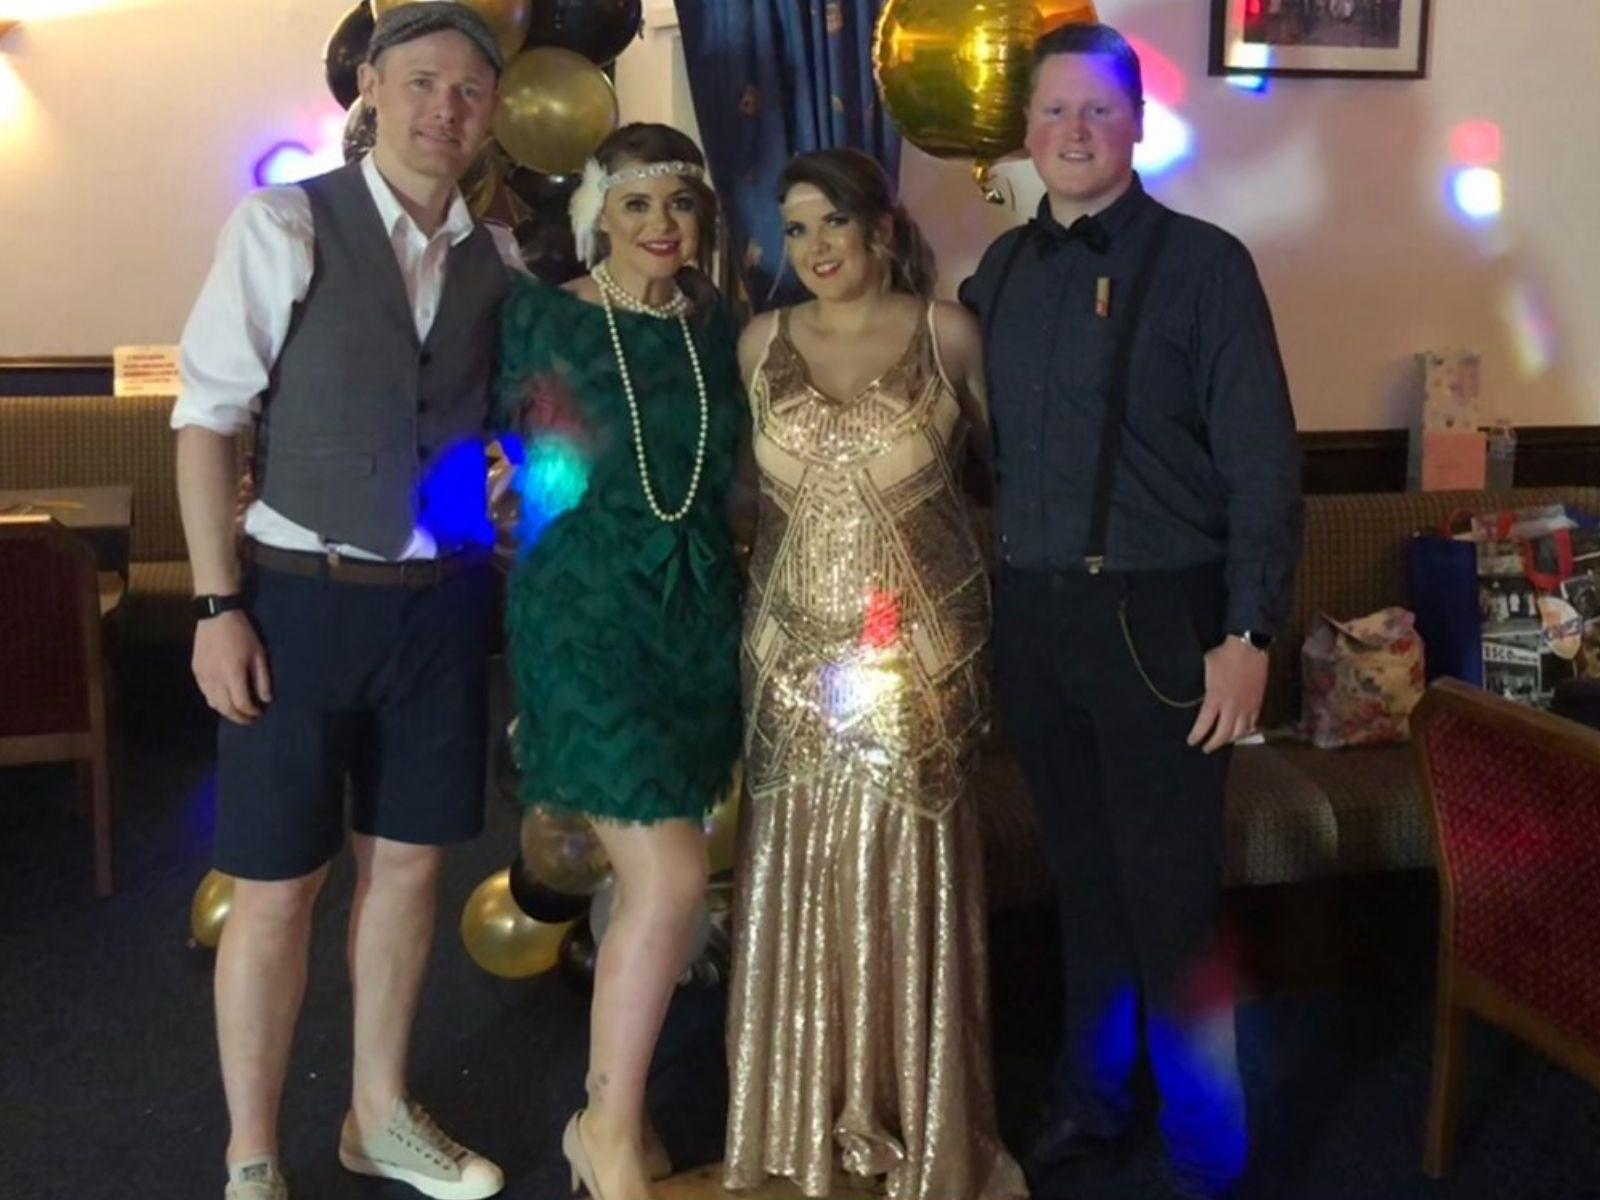 Bespoke birthday gown